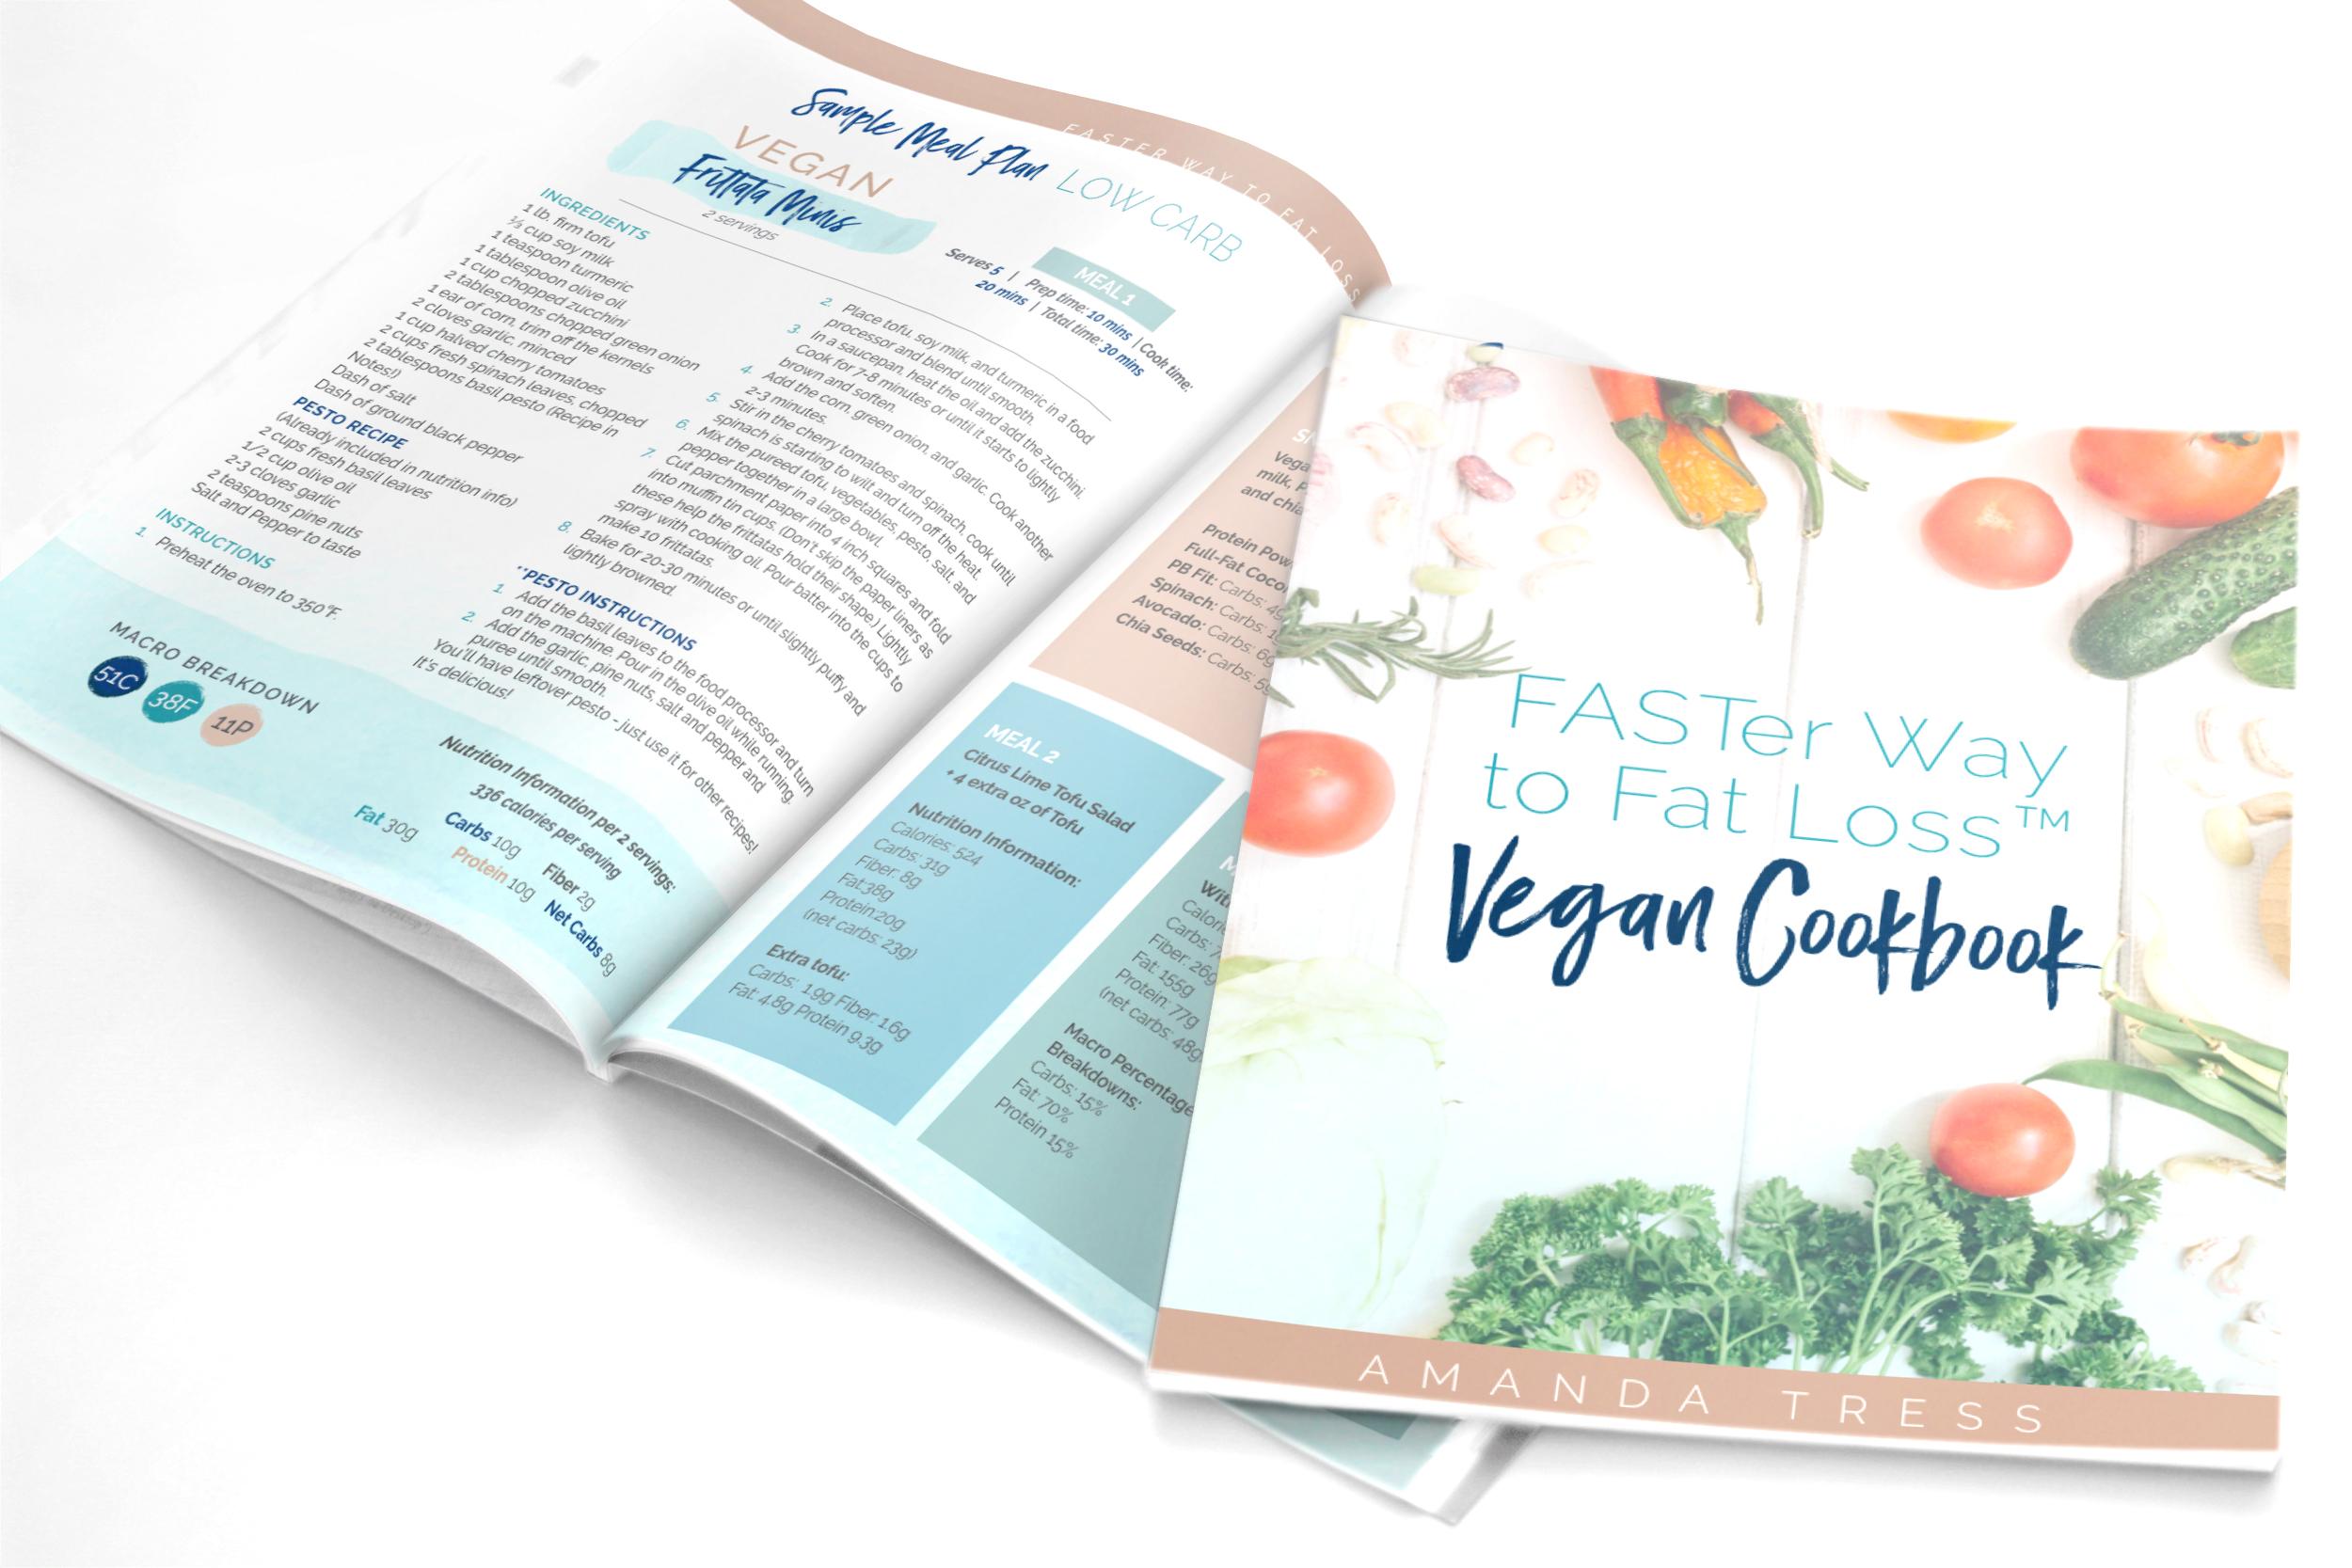 FASTer Way to Fat Loss Vegan Cookbook -